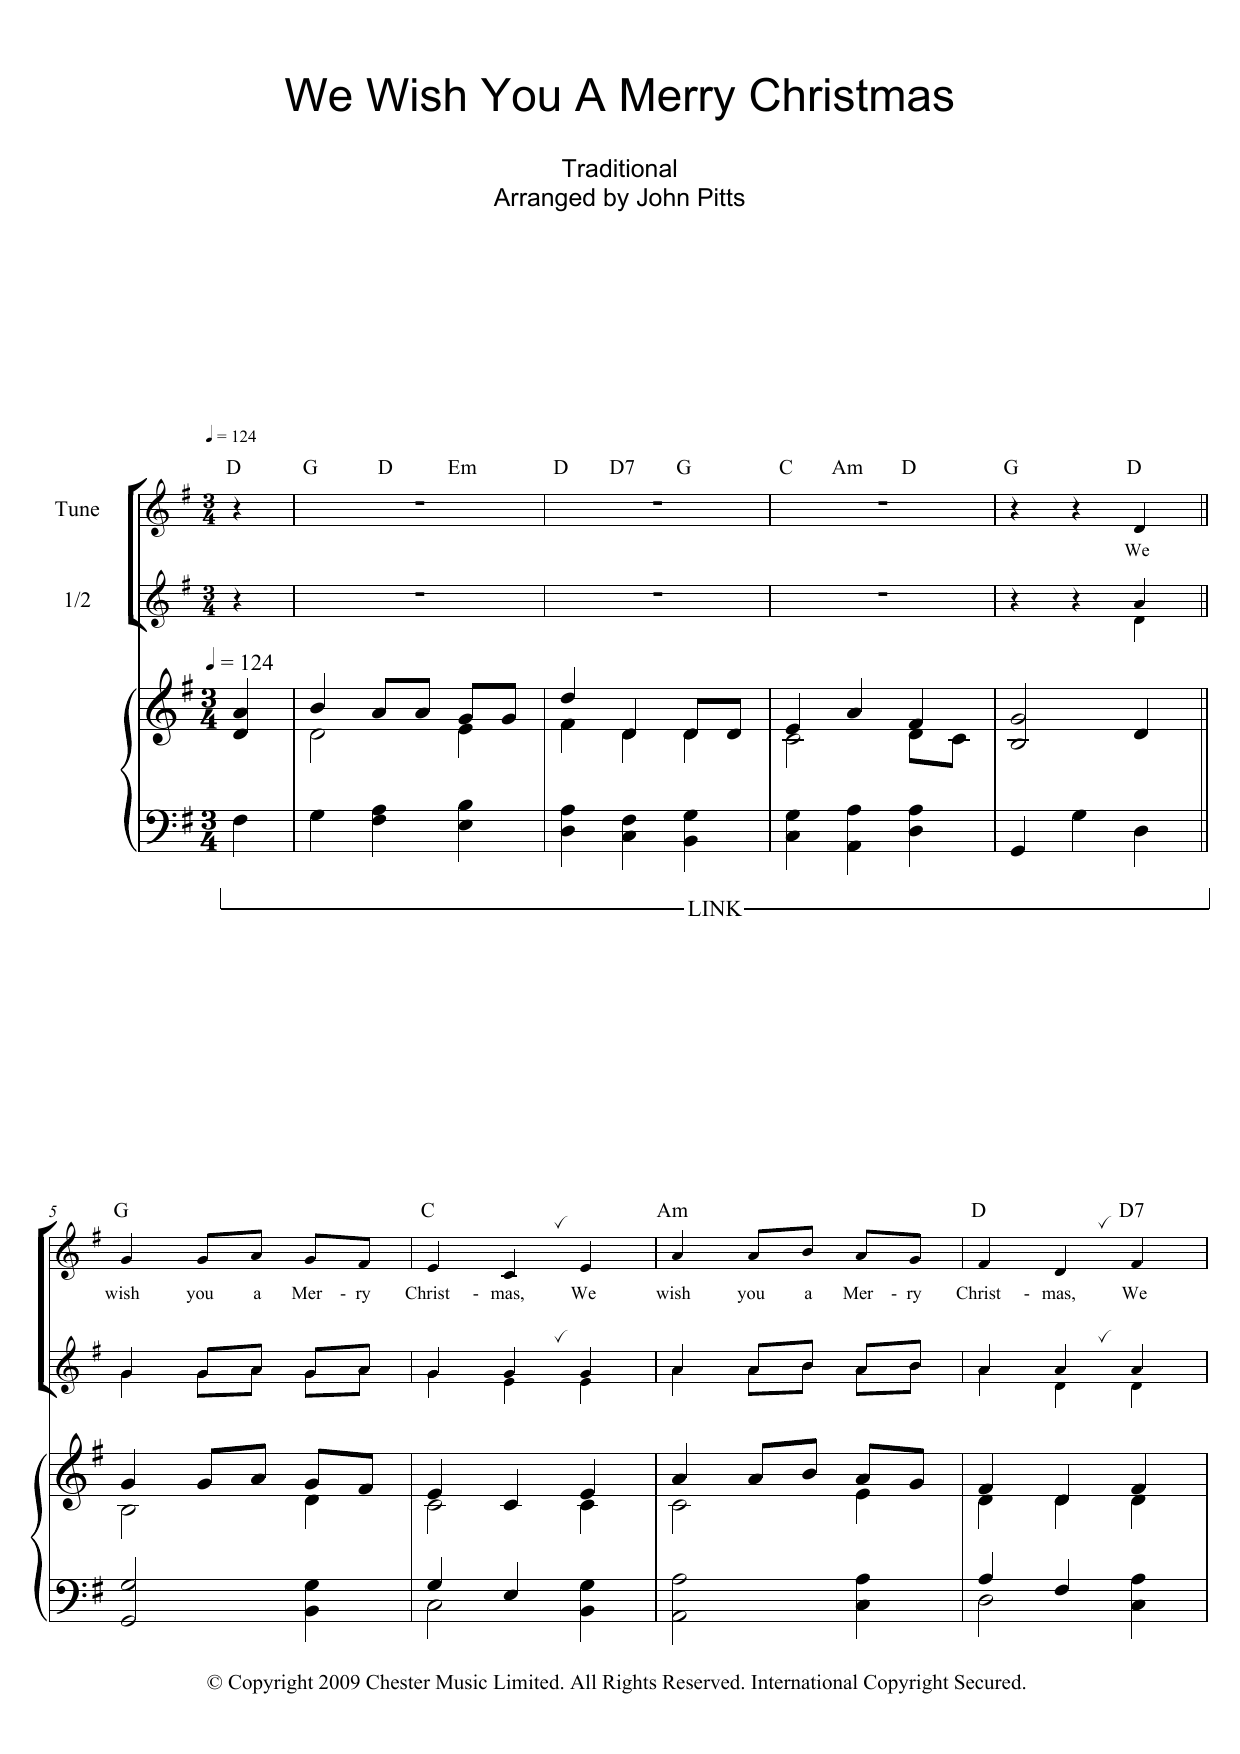 I Wish You A Merry Christmas Lyrics.We Wish You A Merry Christmas By Christmas Carol Keyboard Abridged Digital Sheet Music